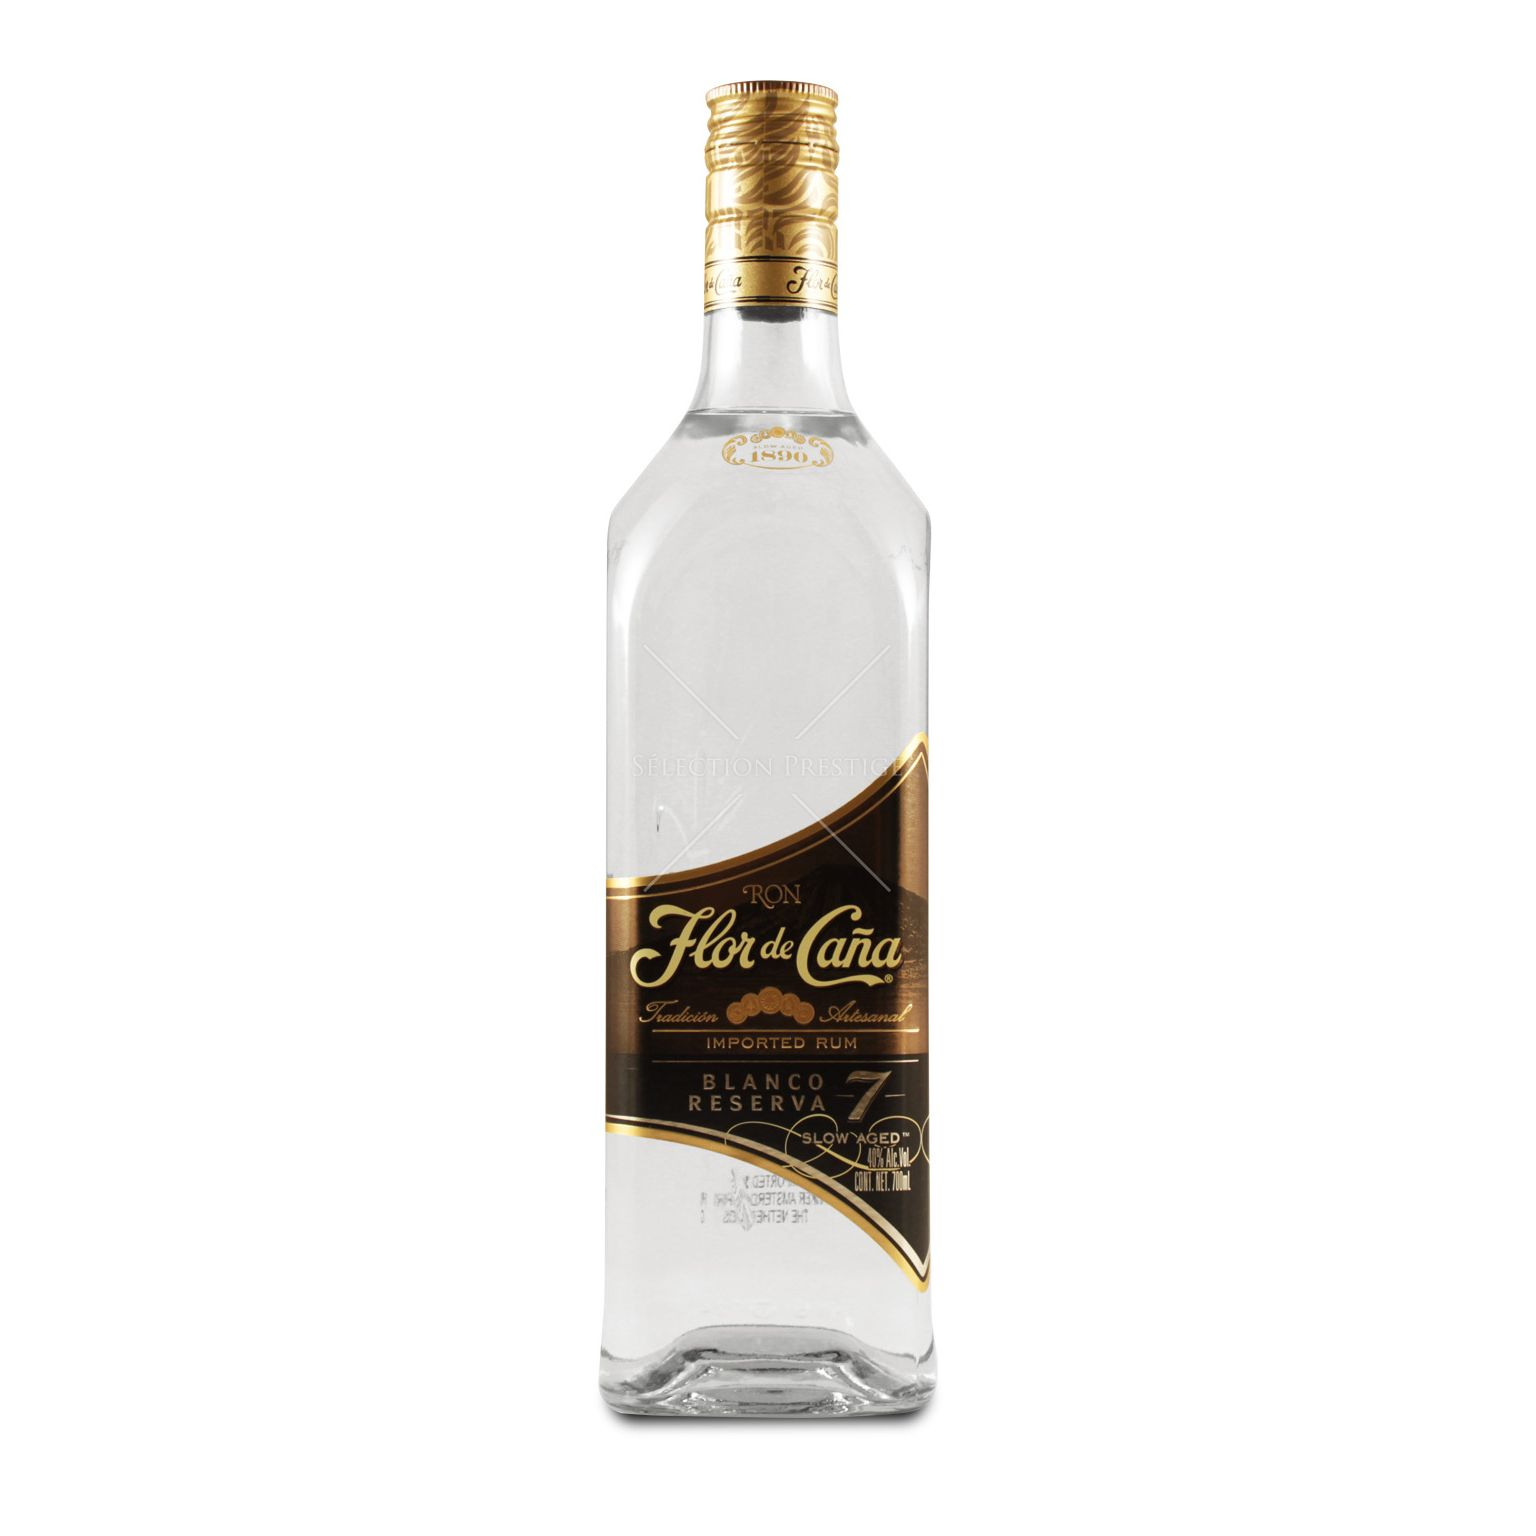 Flor De Caña Blanco Reserva 07l 40 Vol Flor De Caña Rum